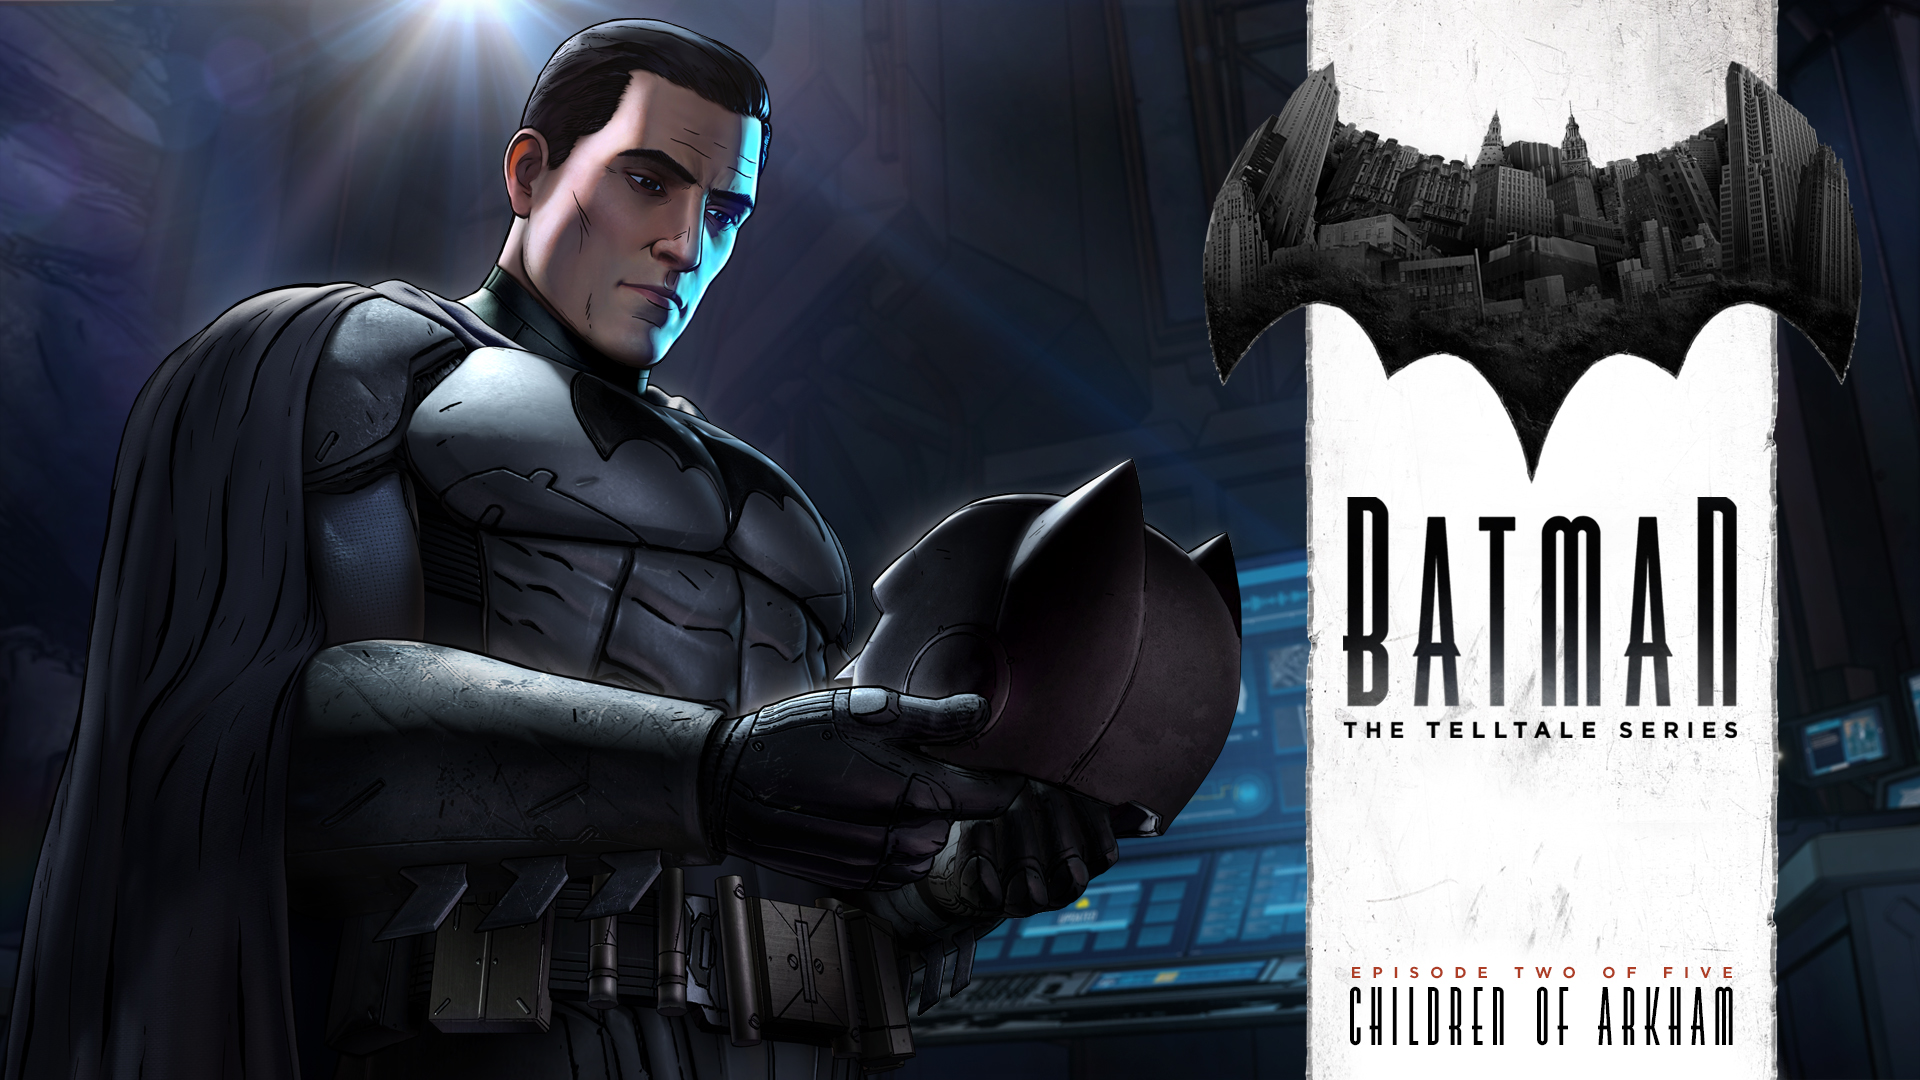 Дата выхода второго эпизод Batman - The Telltale Series